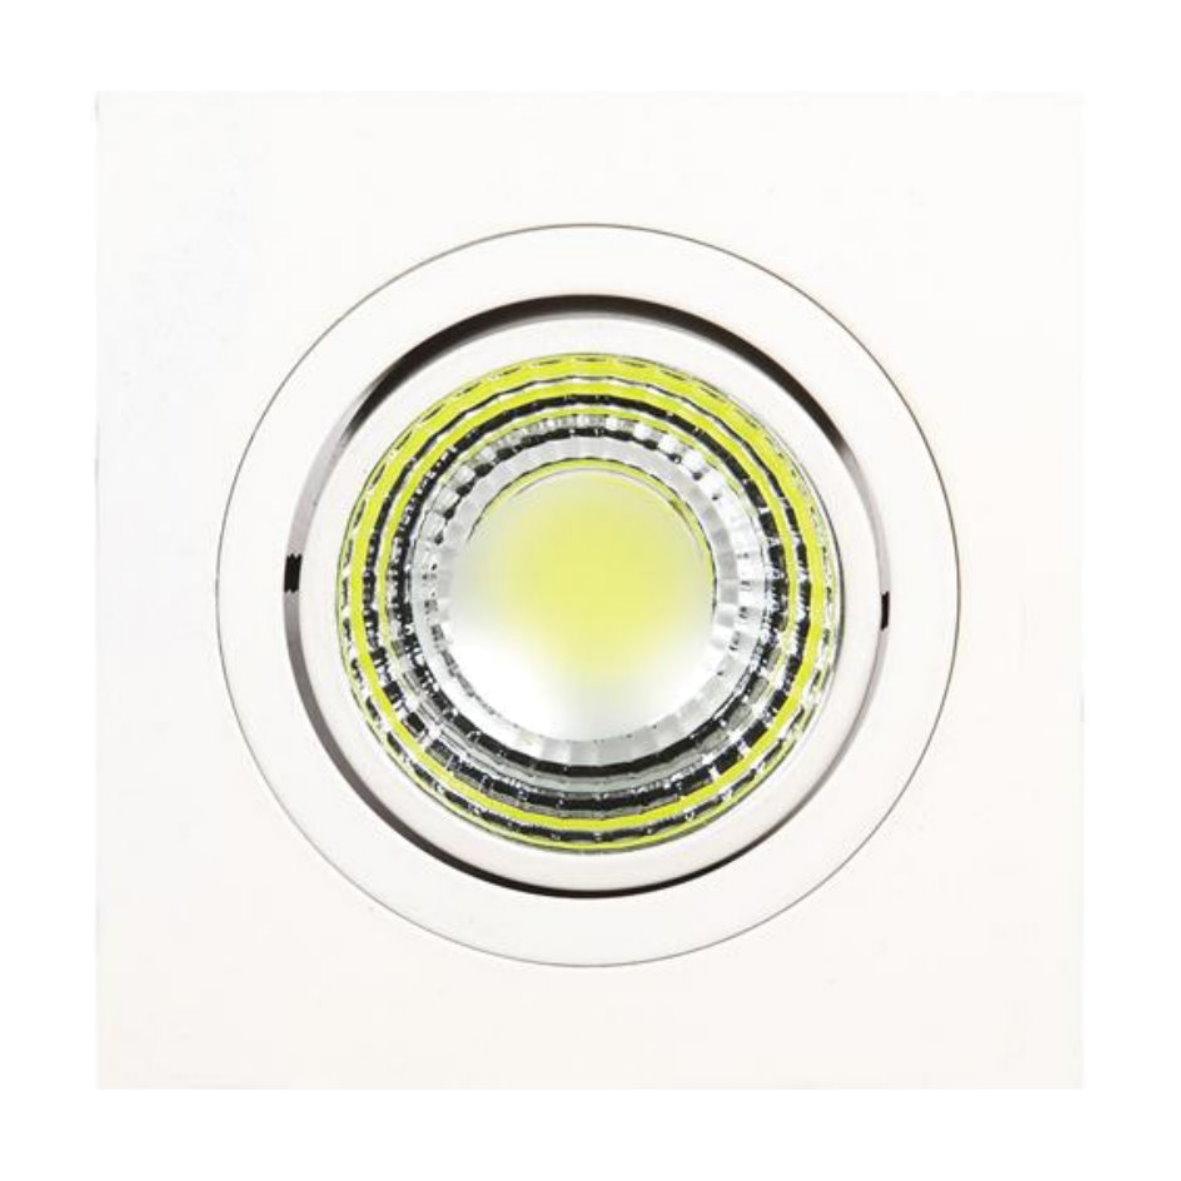 COB LED Einbaustrahler Einbauleuchte Spot Strahler Leuchte  # Led Deckenleuchte Lavinia